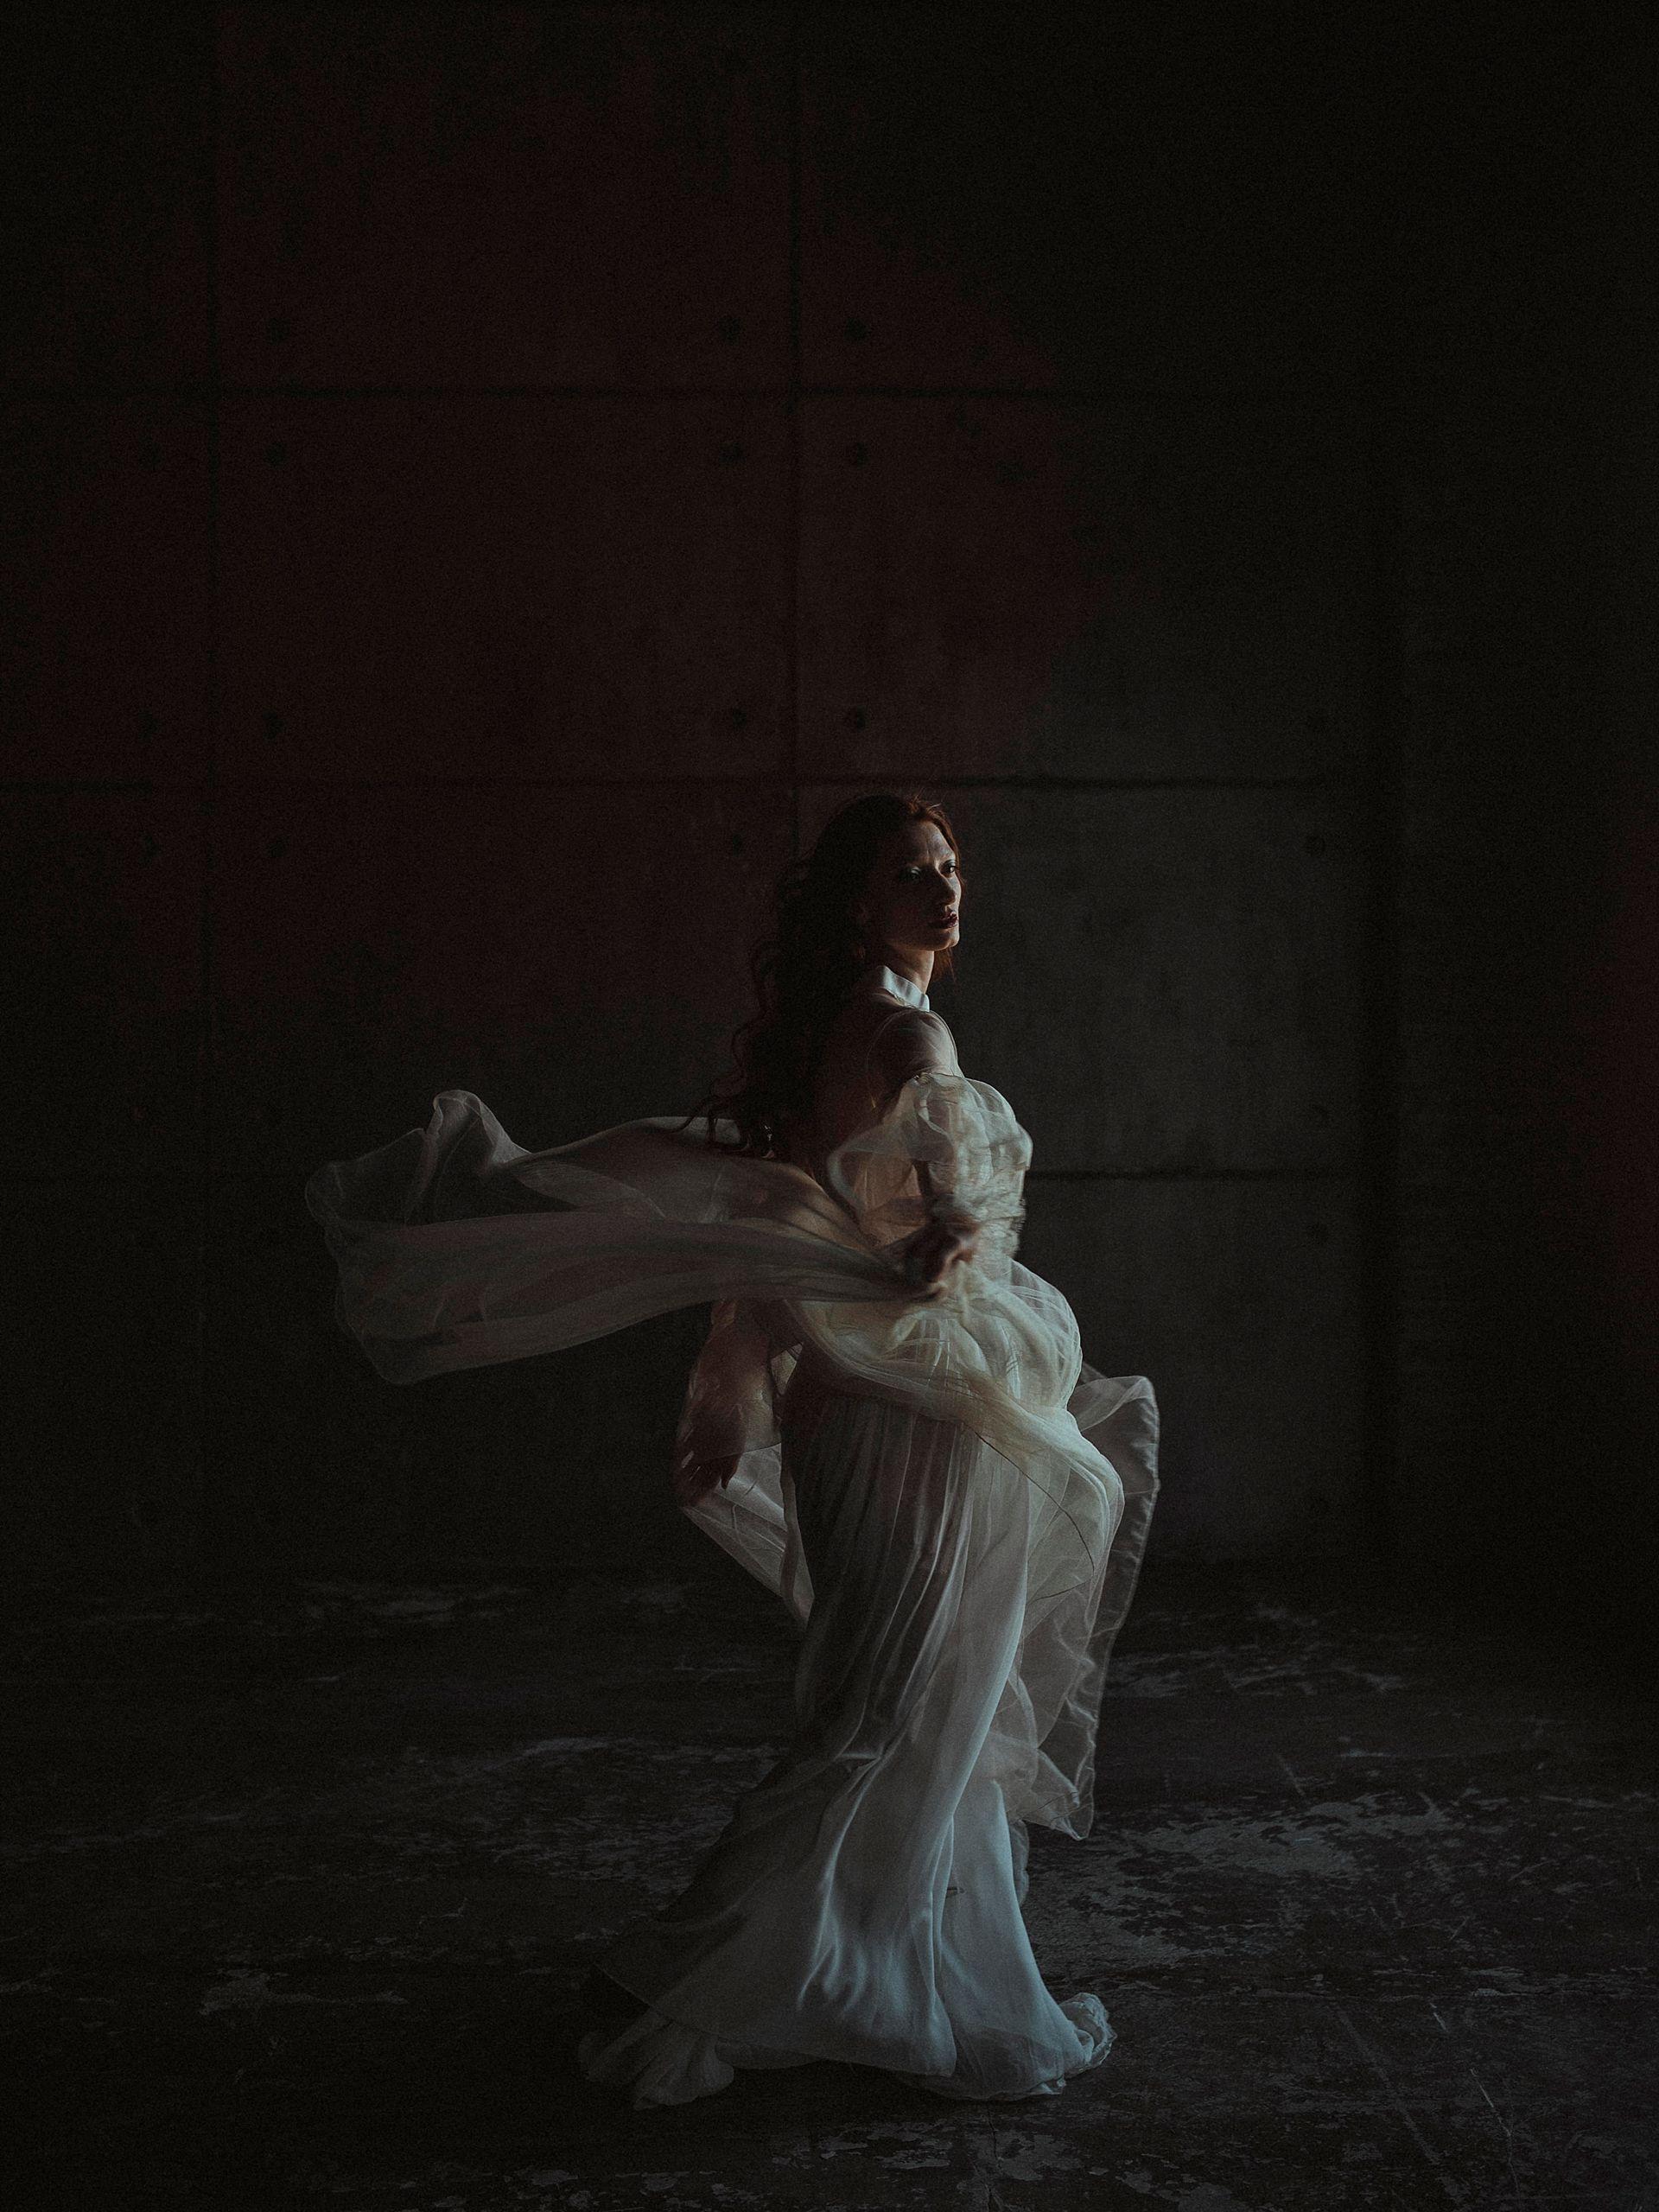 Decadent Wedding Inspiration- Moody Wedding Inspiration- Sudio Fotografico Bacci- Unconventional Wedding- bride twirling in dress